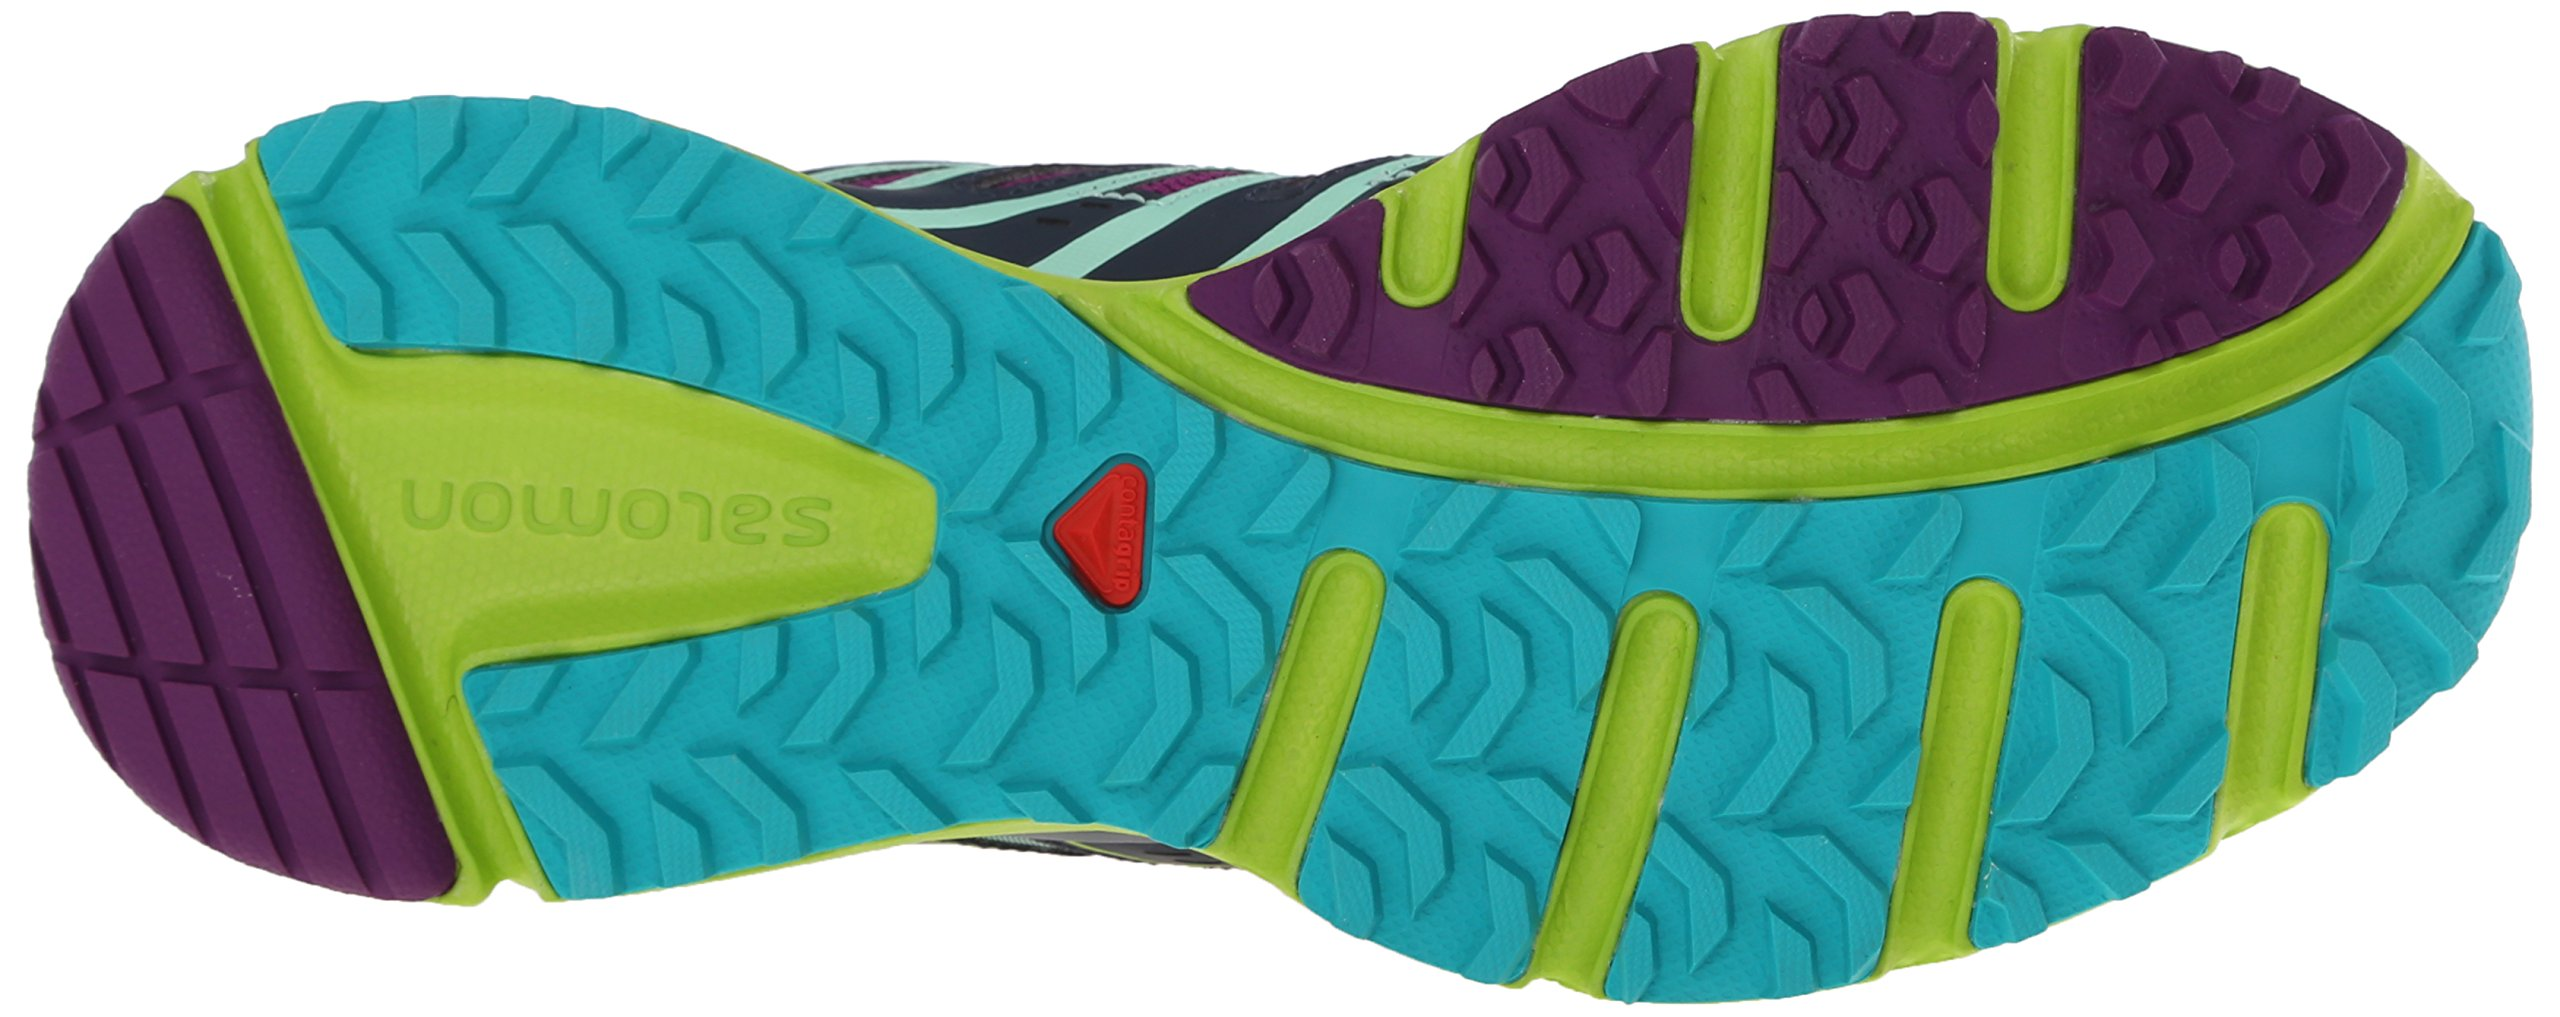 Salomon Women's X-Mission 3 W Trail Running Shoe, Teal Blue/Granny Green/Passion Purple, 7.5 B US by Salomon (Image #3)